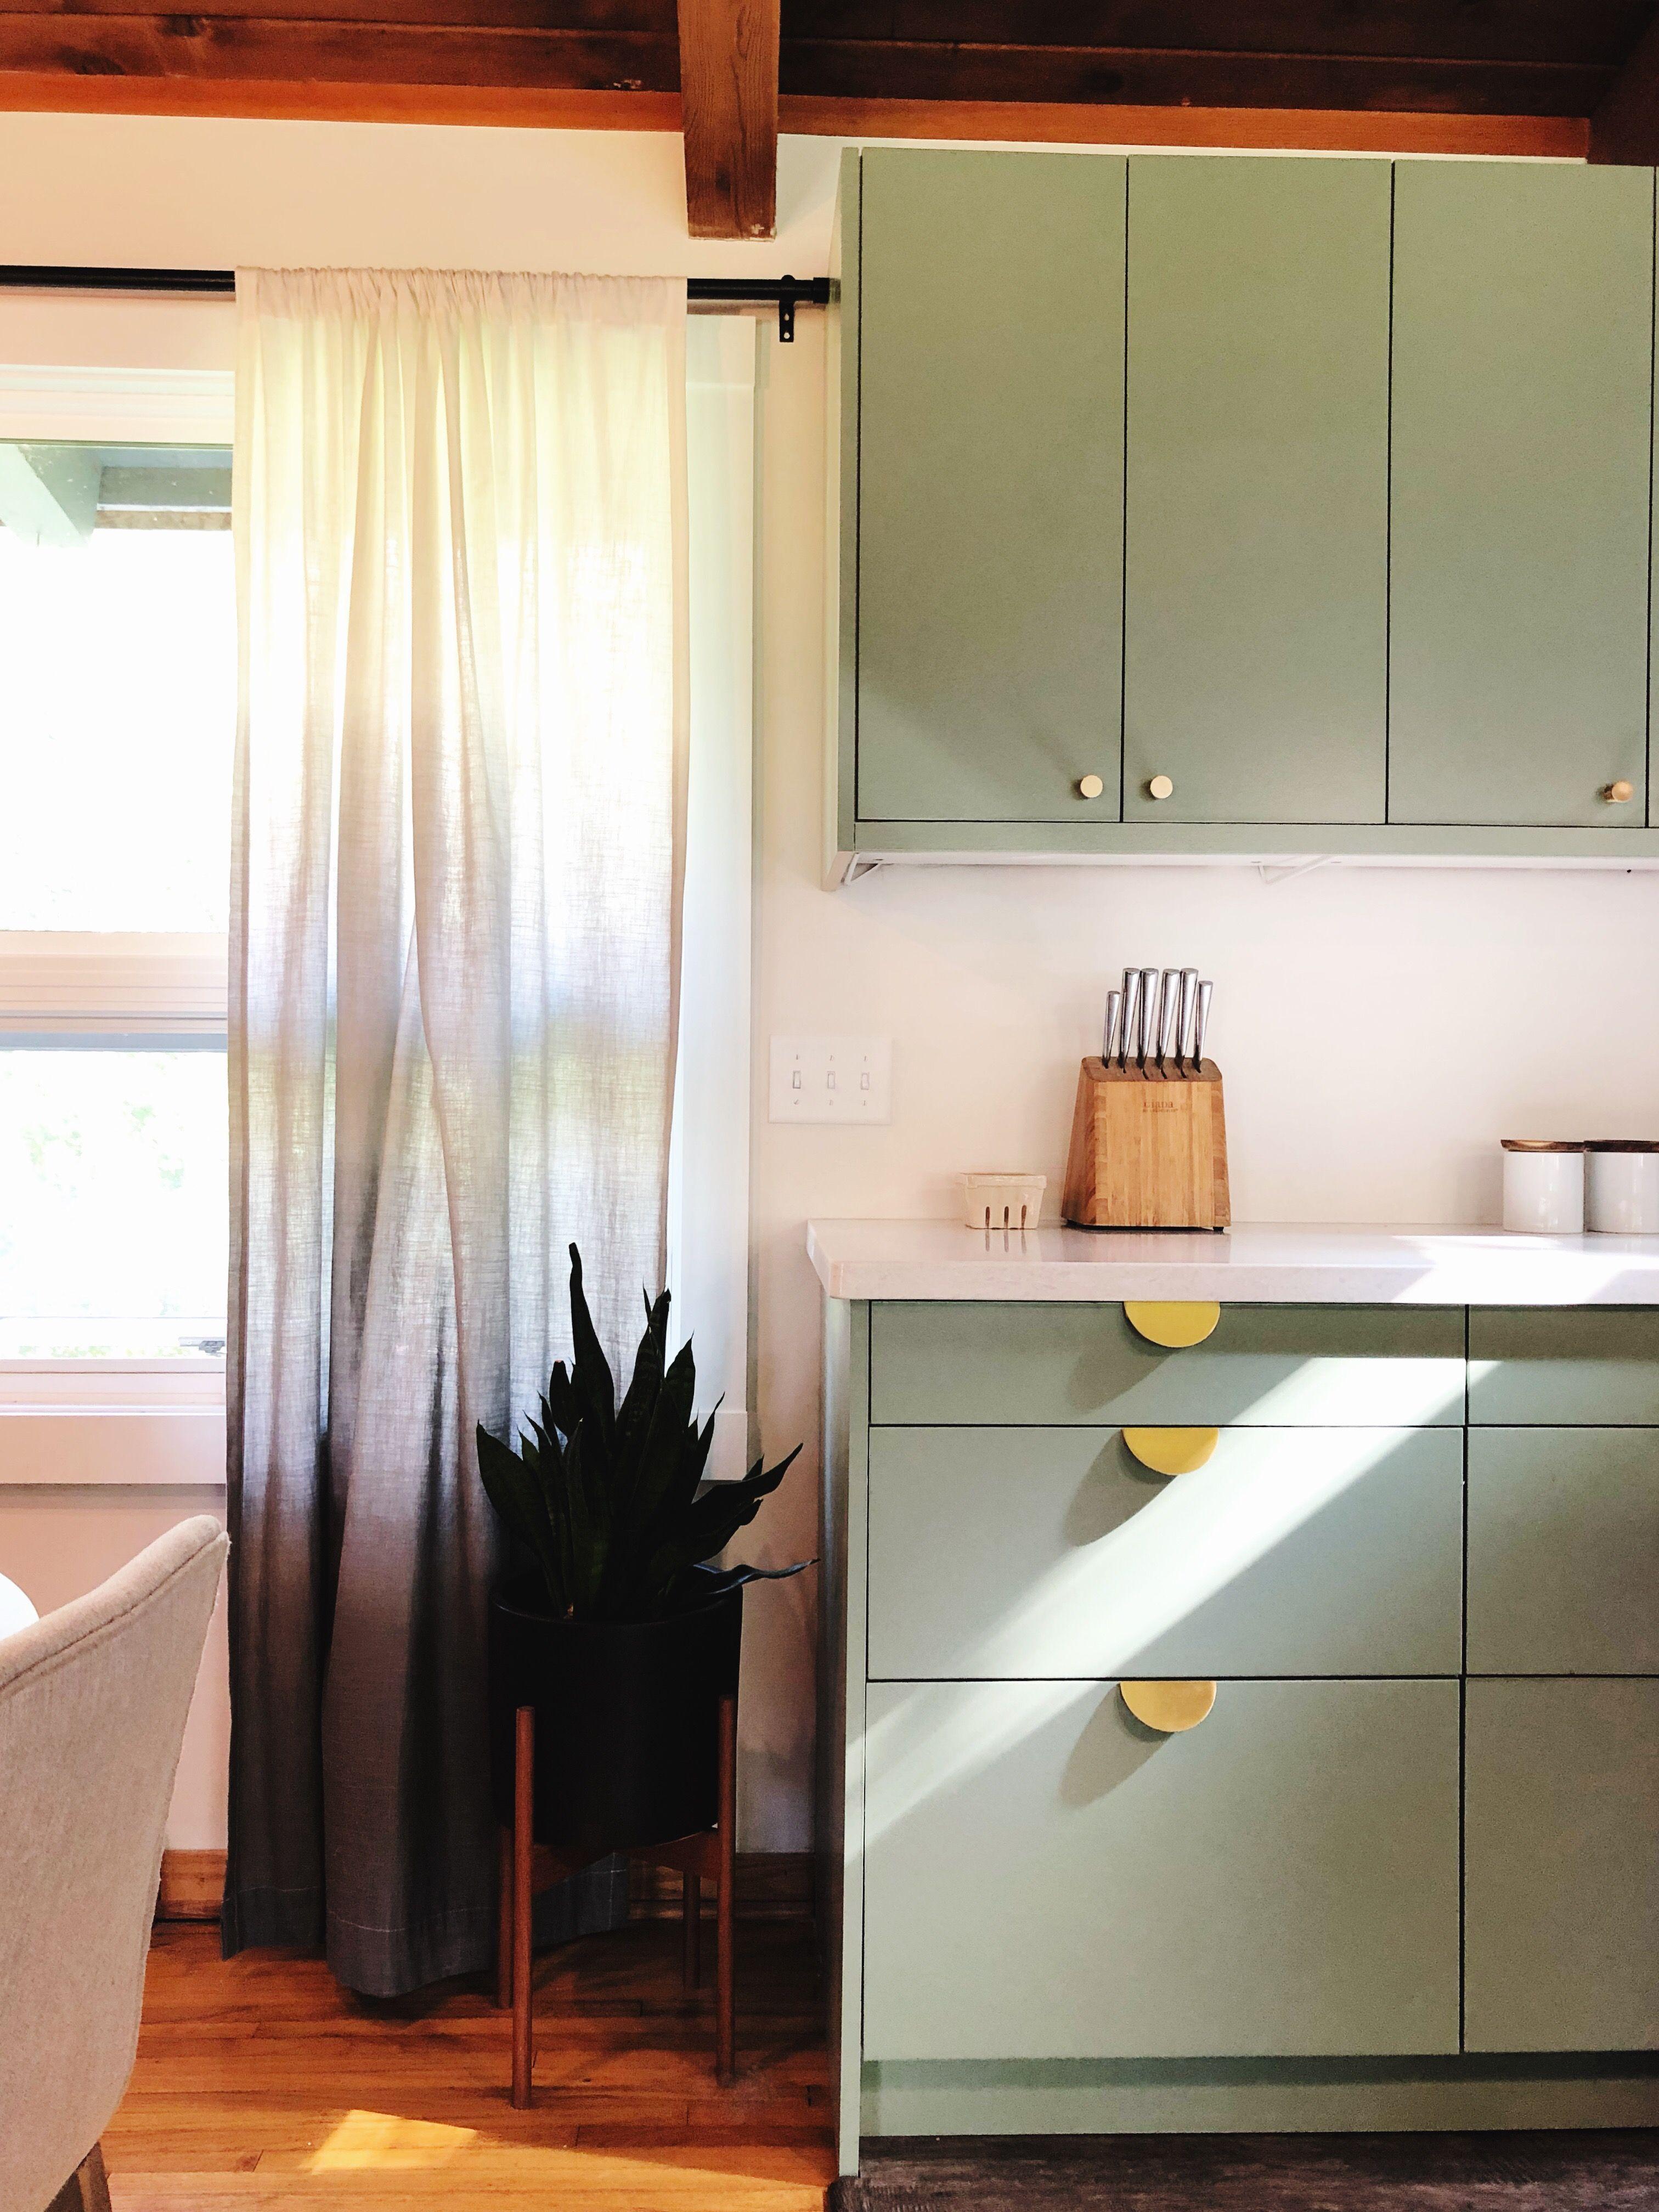 Semihandmade Diy Slab Cabinet Fronts Diy Cabinet Doors Slab Door Kitchen Kitchen Cabnet Doors